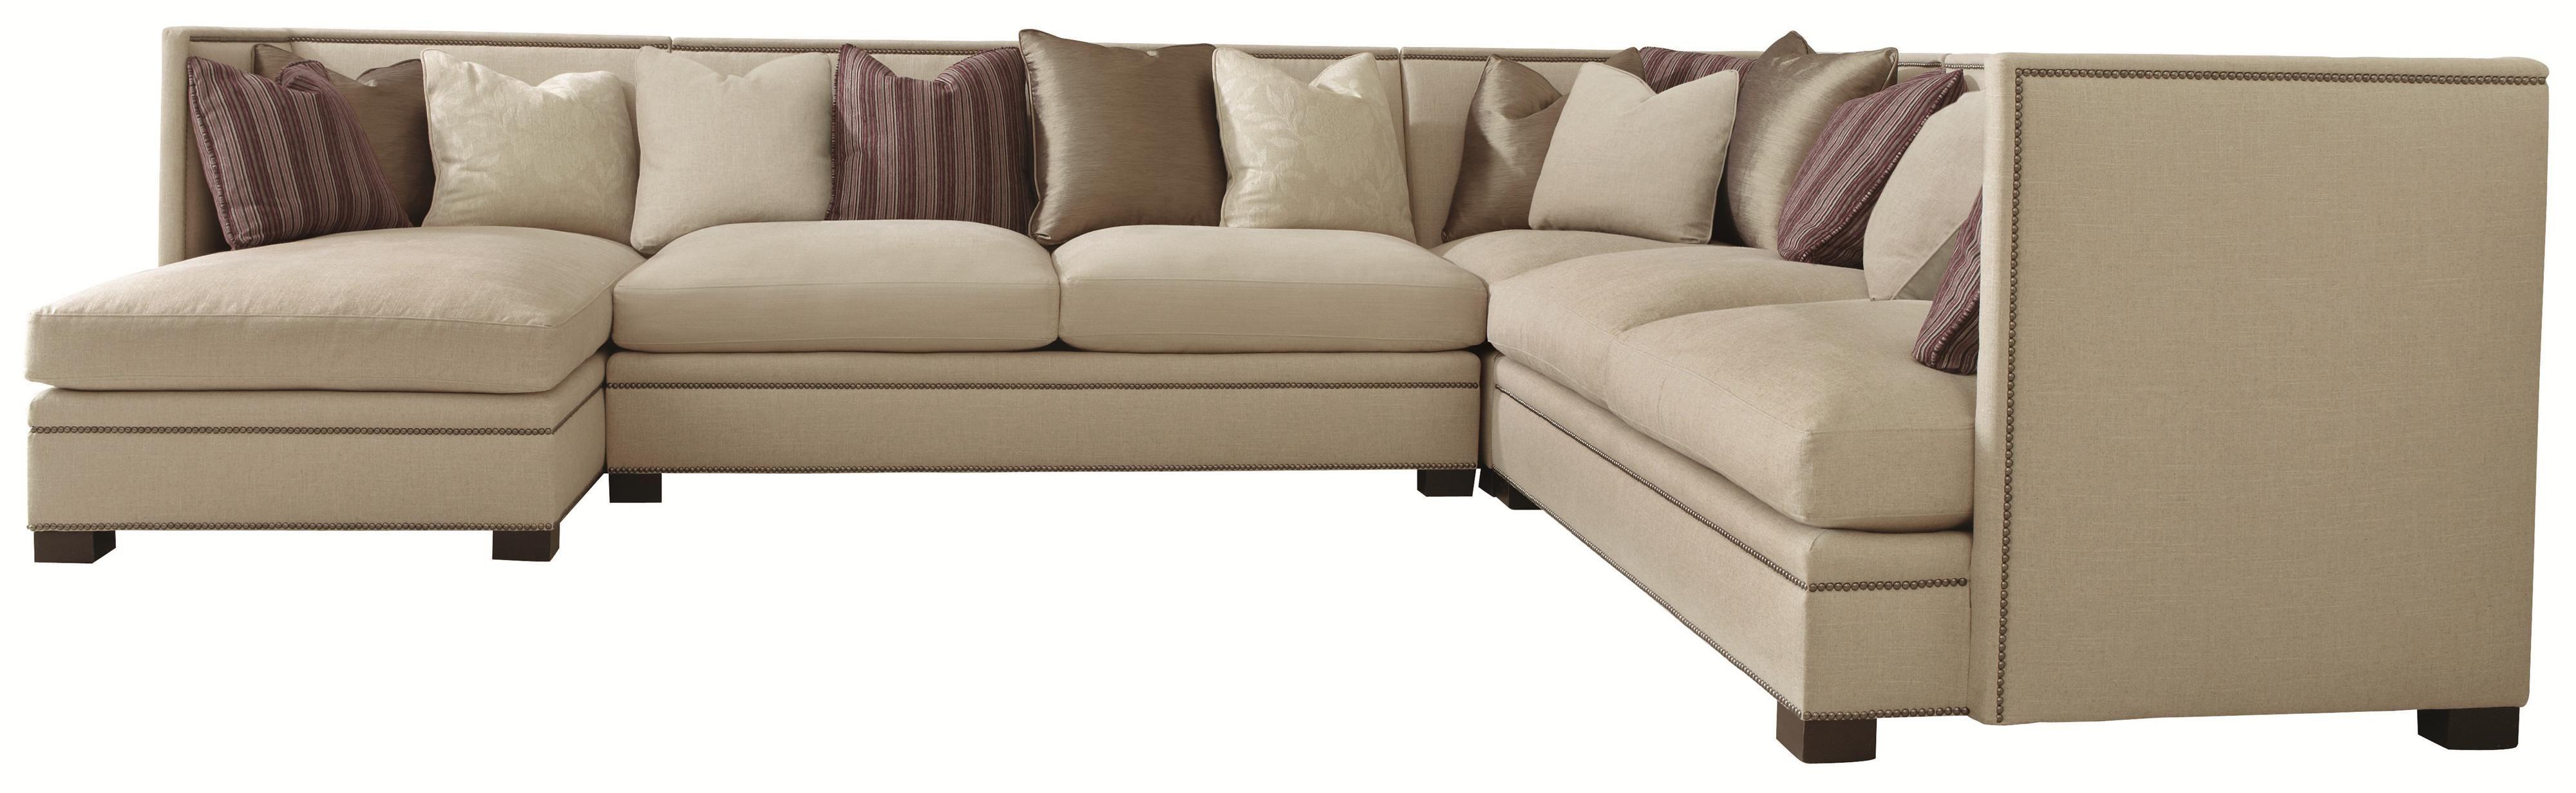 Phenomenal Gramercy Gramercy Sectional Sofa By Bernhardt Furniture Home Remodeling Inspirations Basidirectenergyitoicom